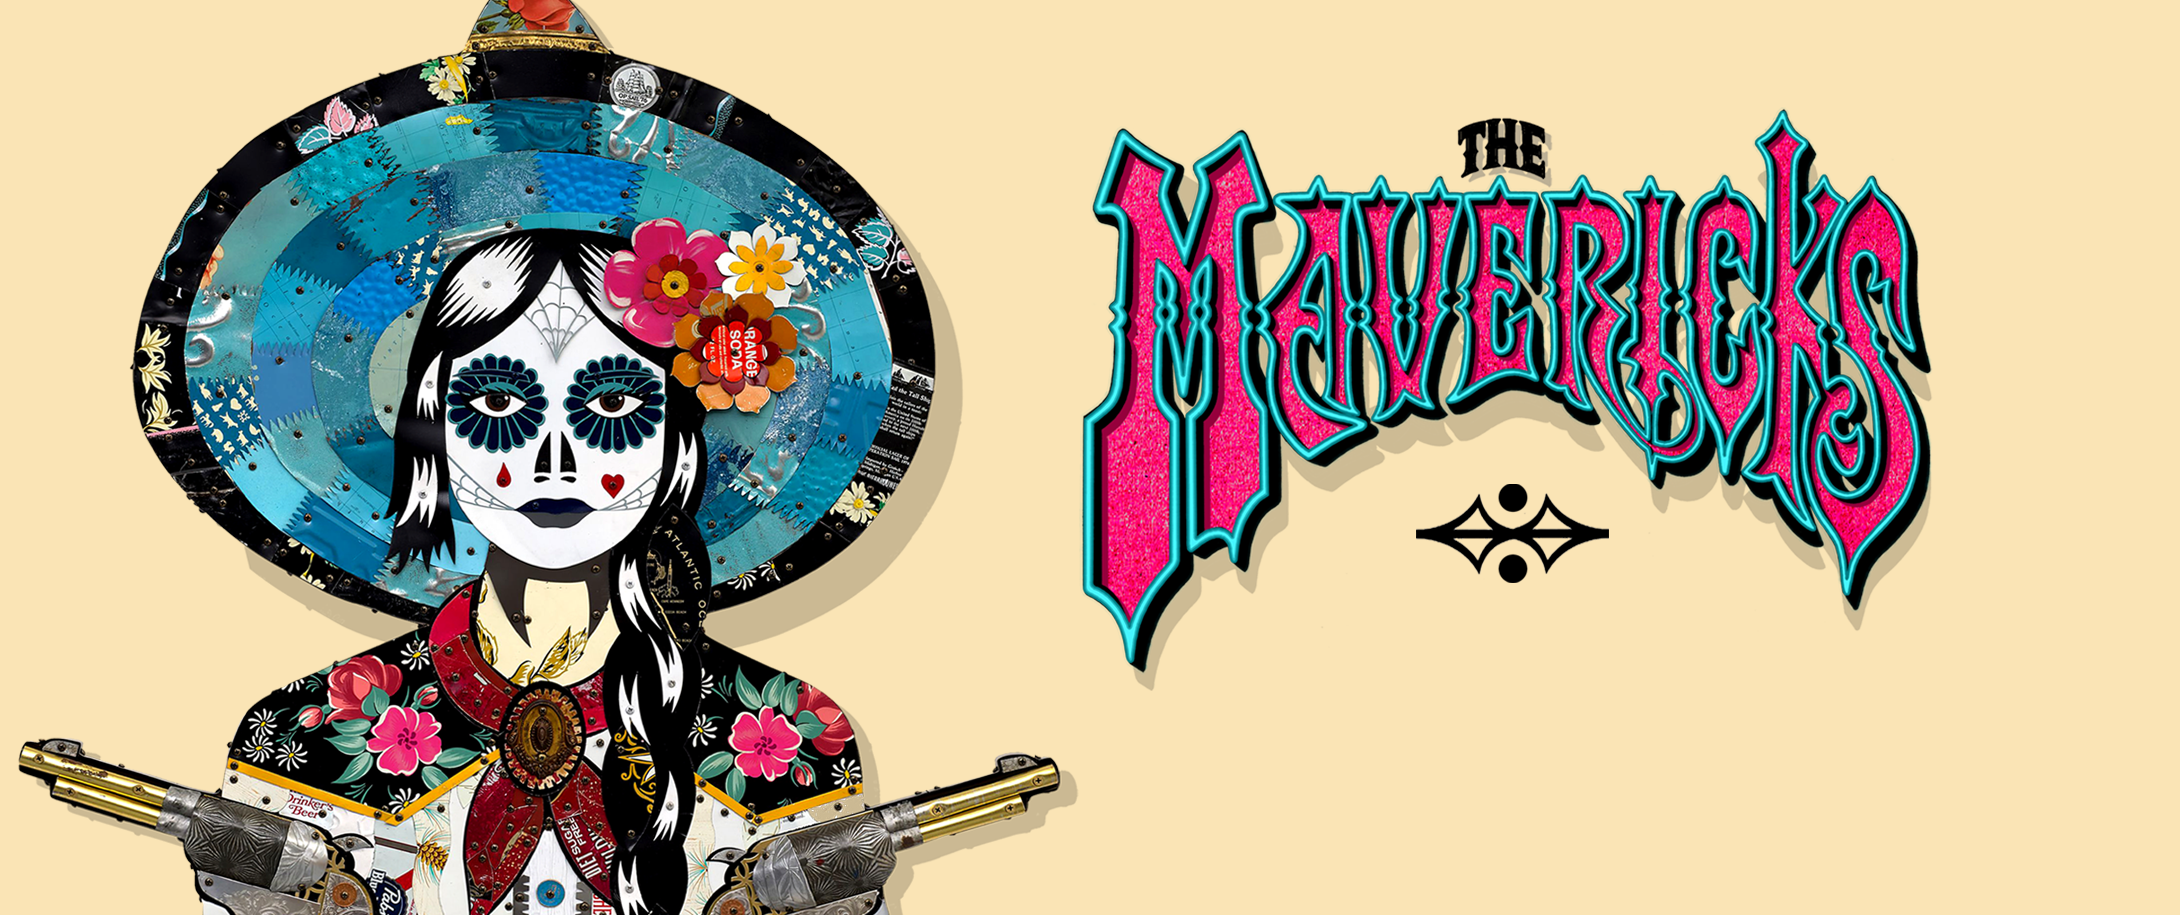 NEW DATE - The Mavericks